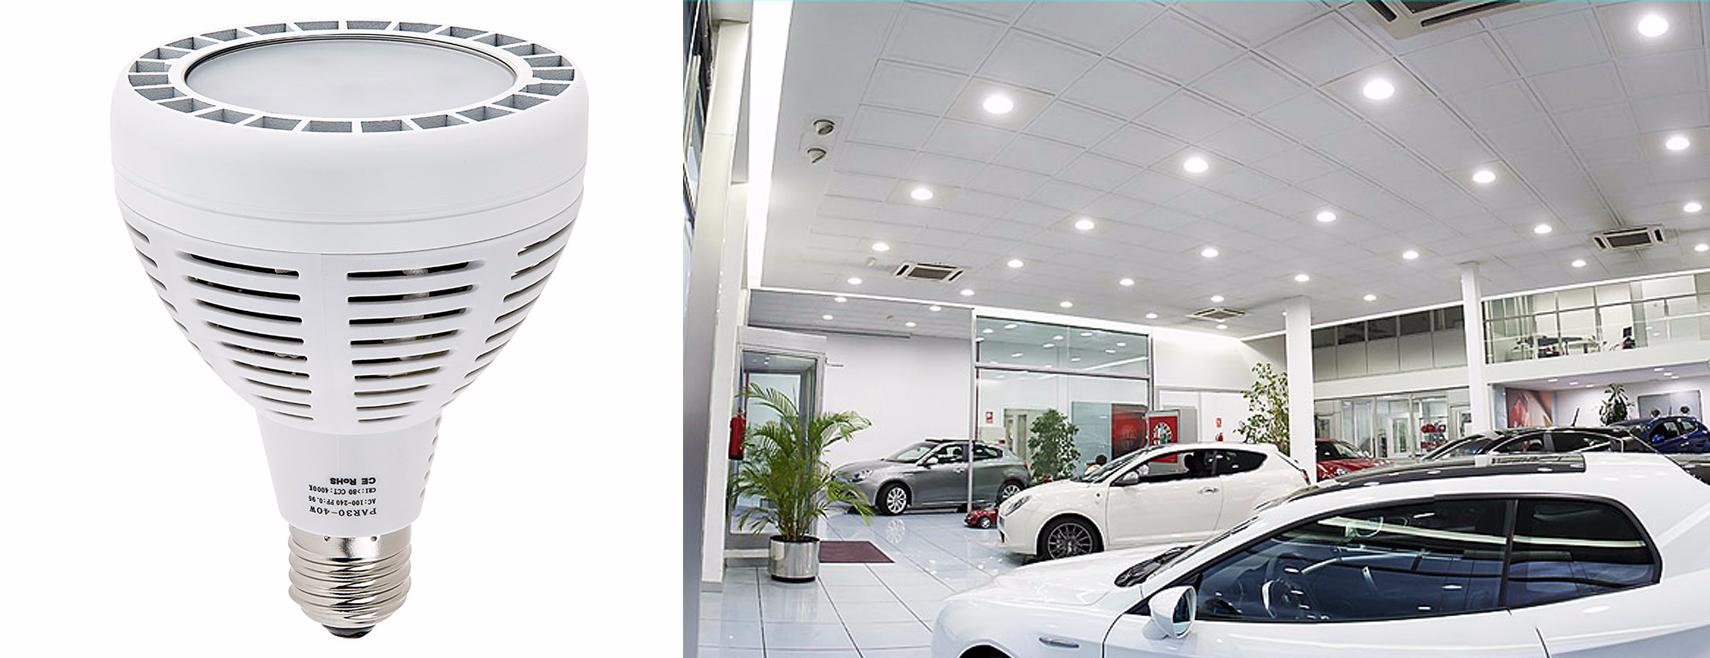 led retail lighting - par bulbs for can lights